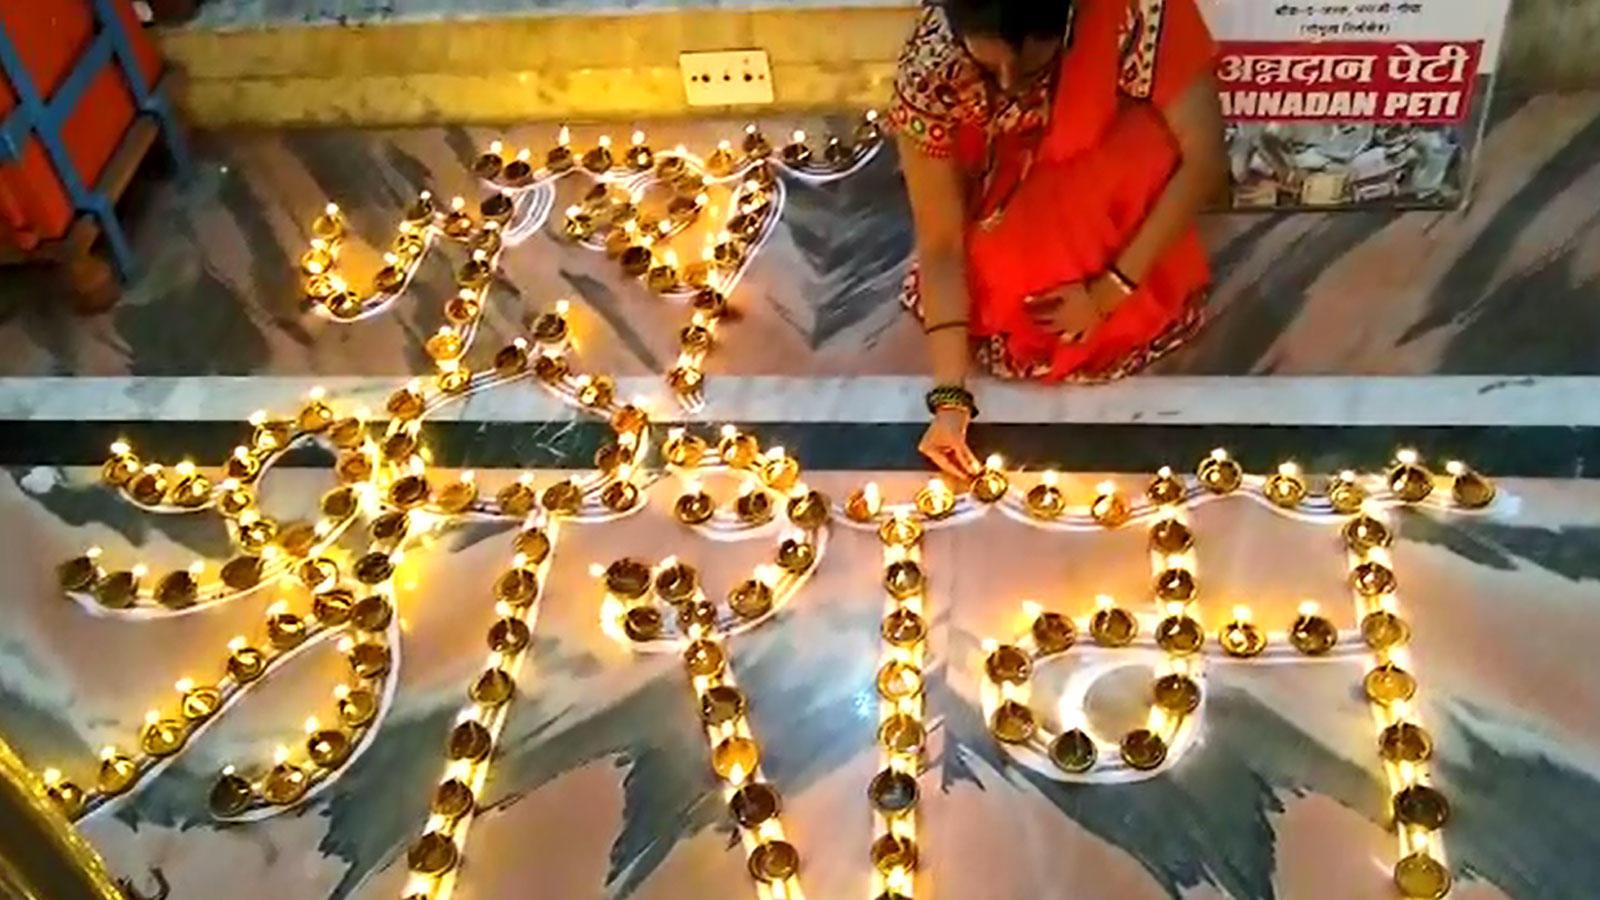 ram-mandir-event-ahead-of-bhoomi-pujan-people-of-goa-light-3000-diyas-to-celebrate